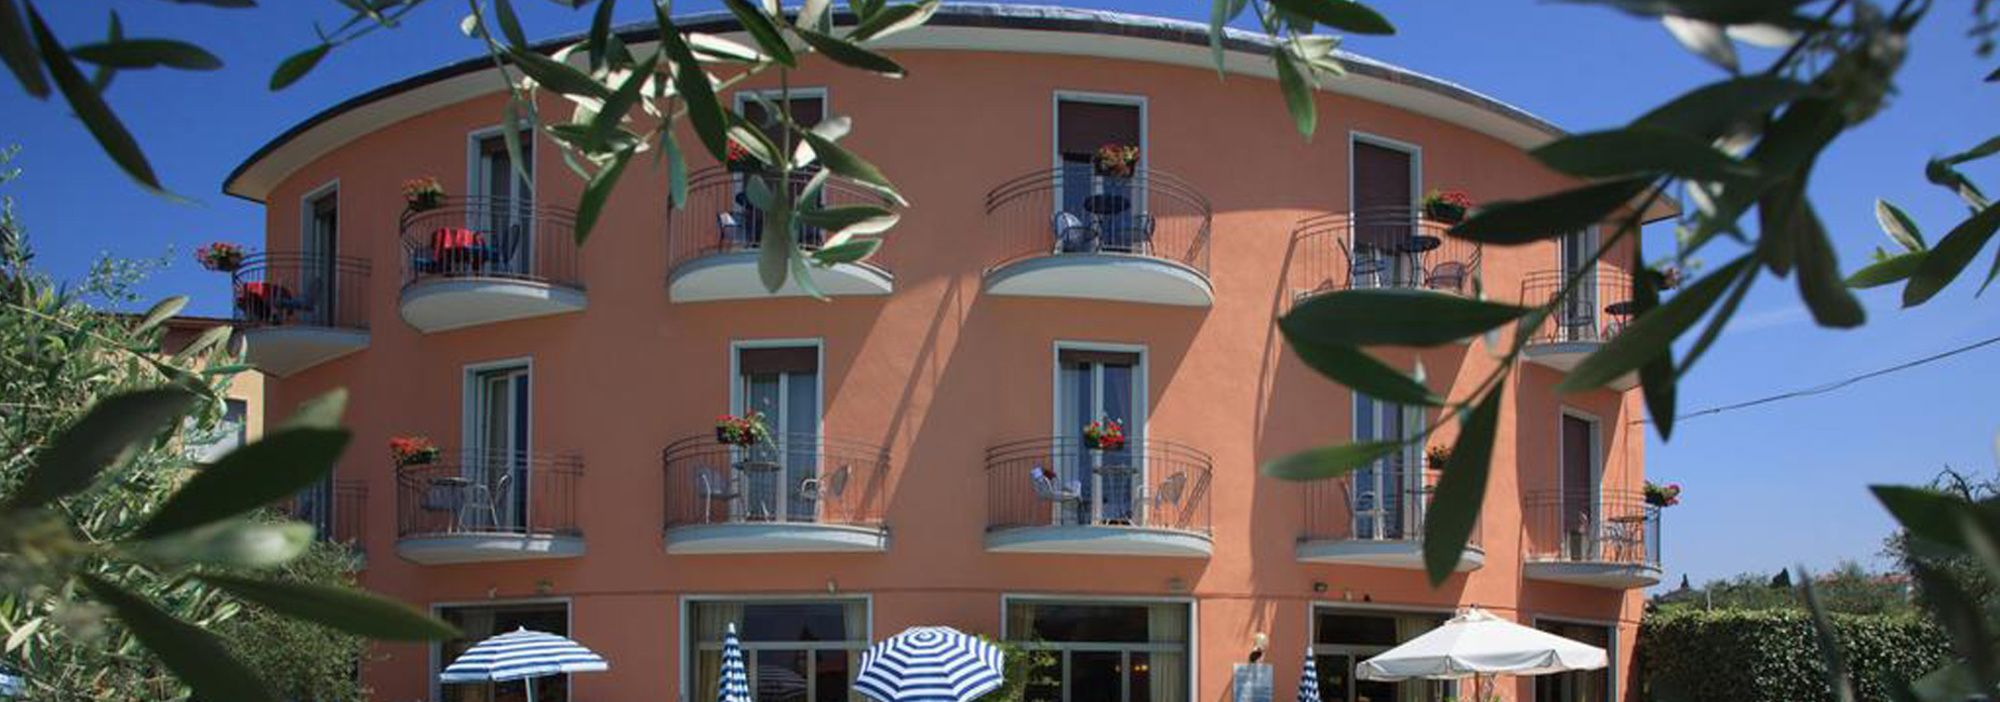 Corte San Luca Bardolino book hotel santa maria with tajawal, book now at best low